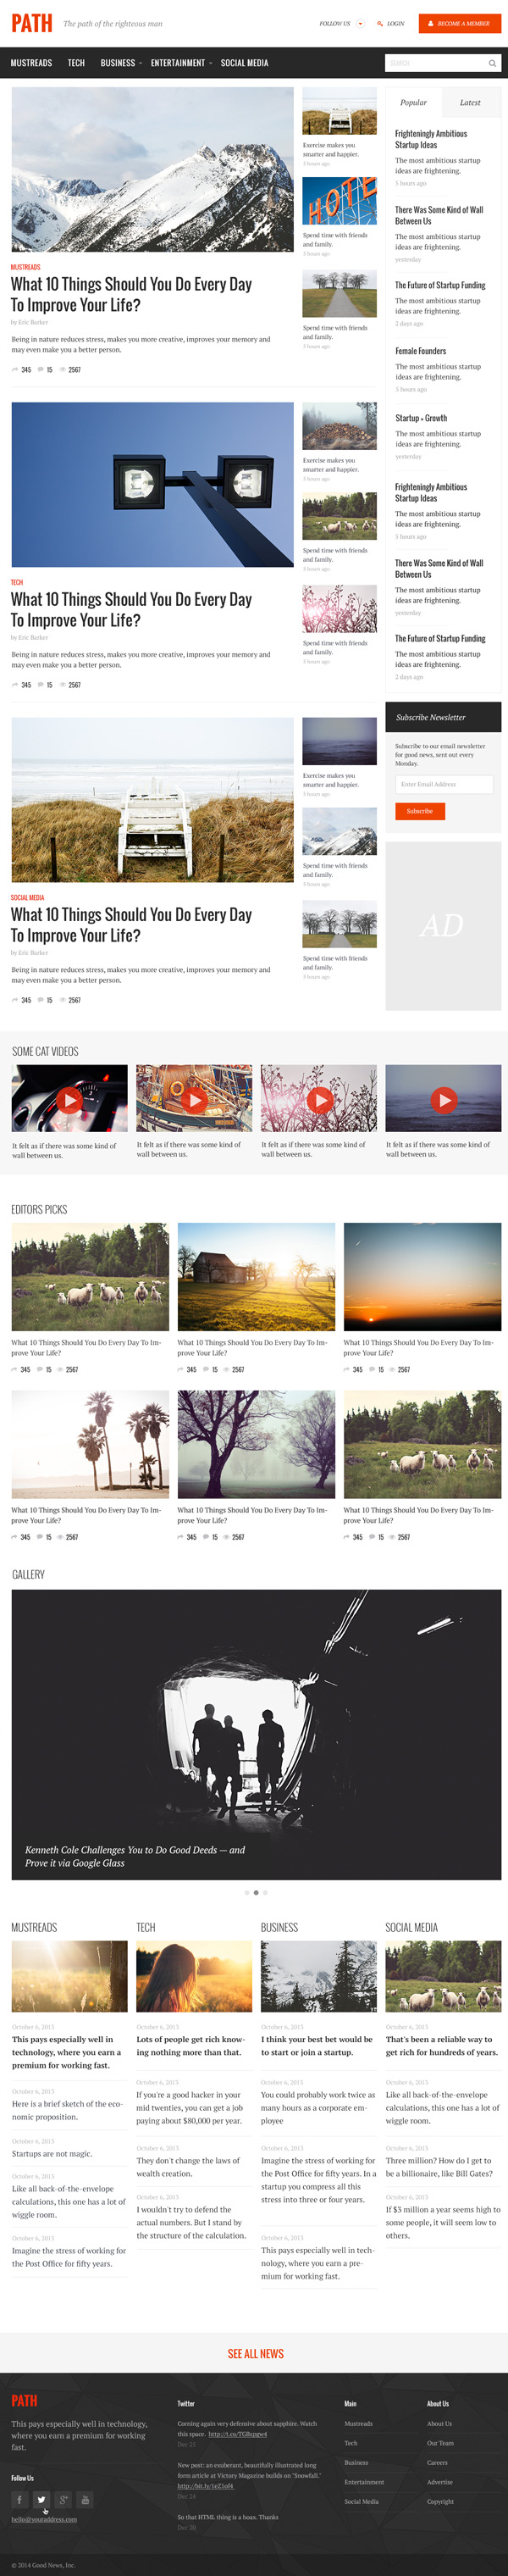 Path – Responsive Multipurpose Blog/Magazine Theme